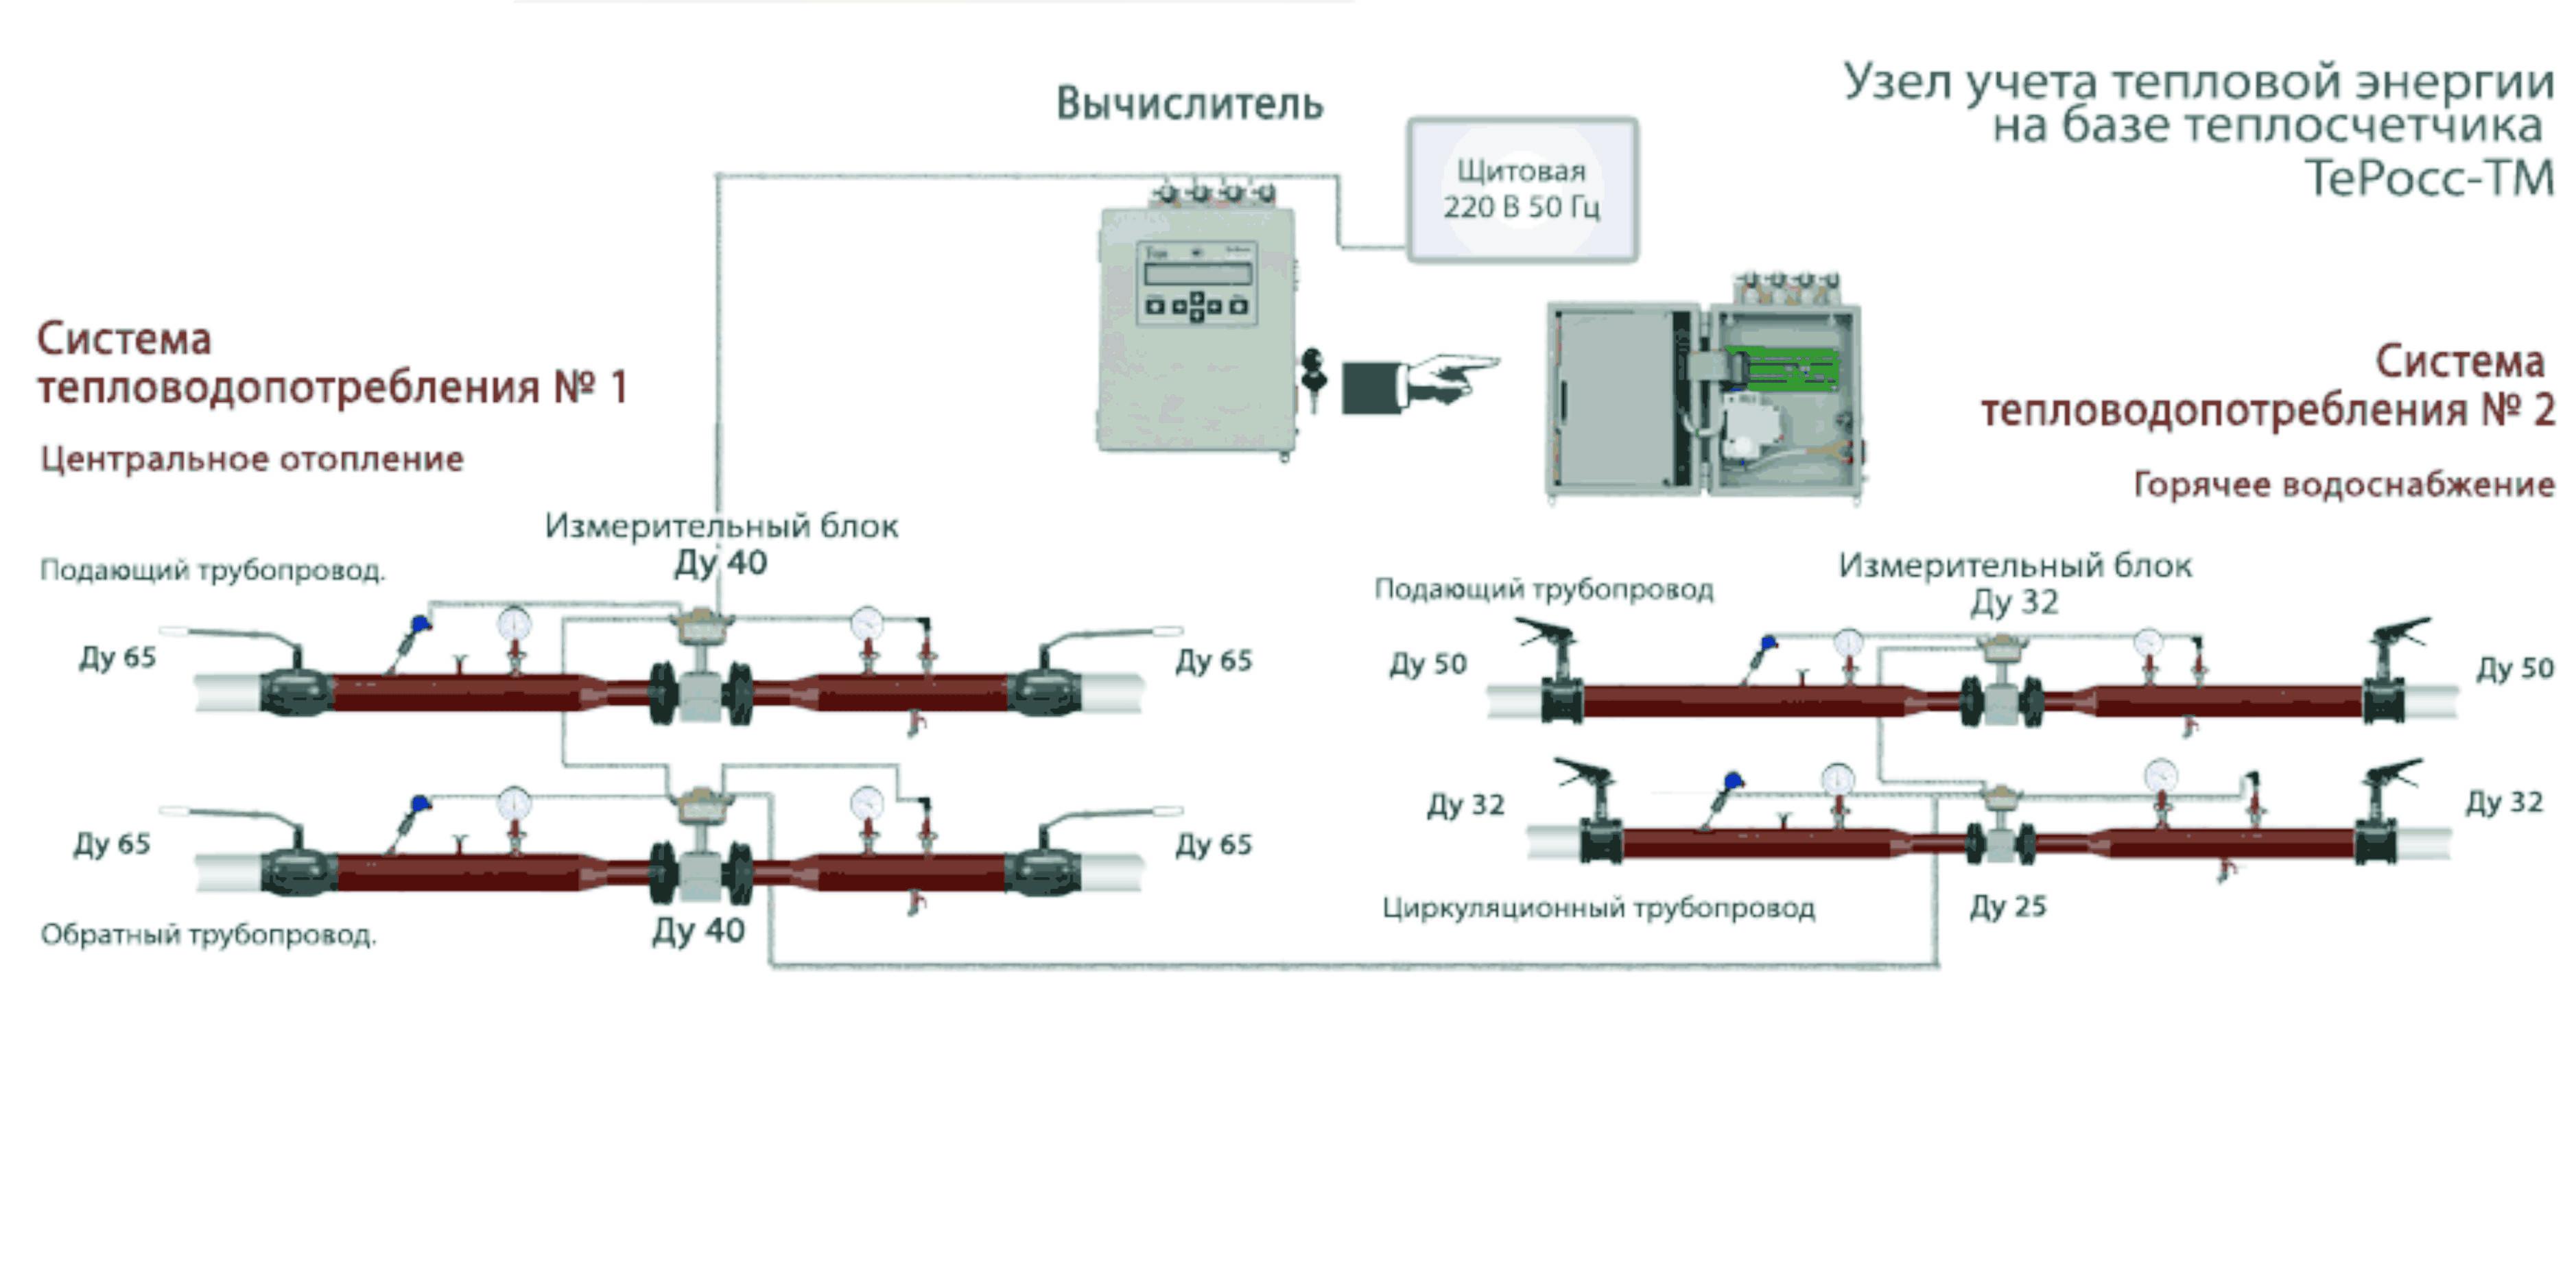 Тепловые счетчики на отопление в многоквартирном доме: 4 вида